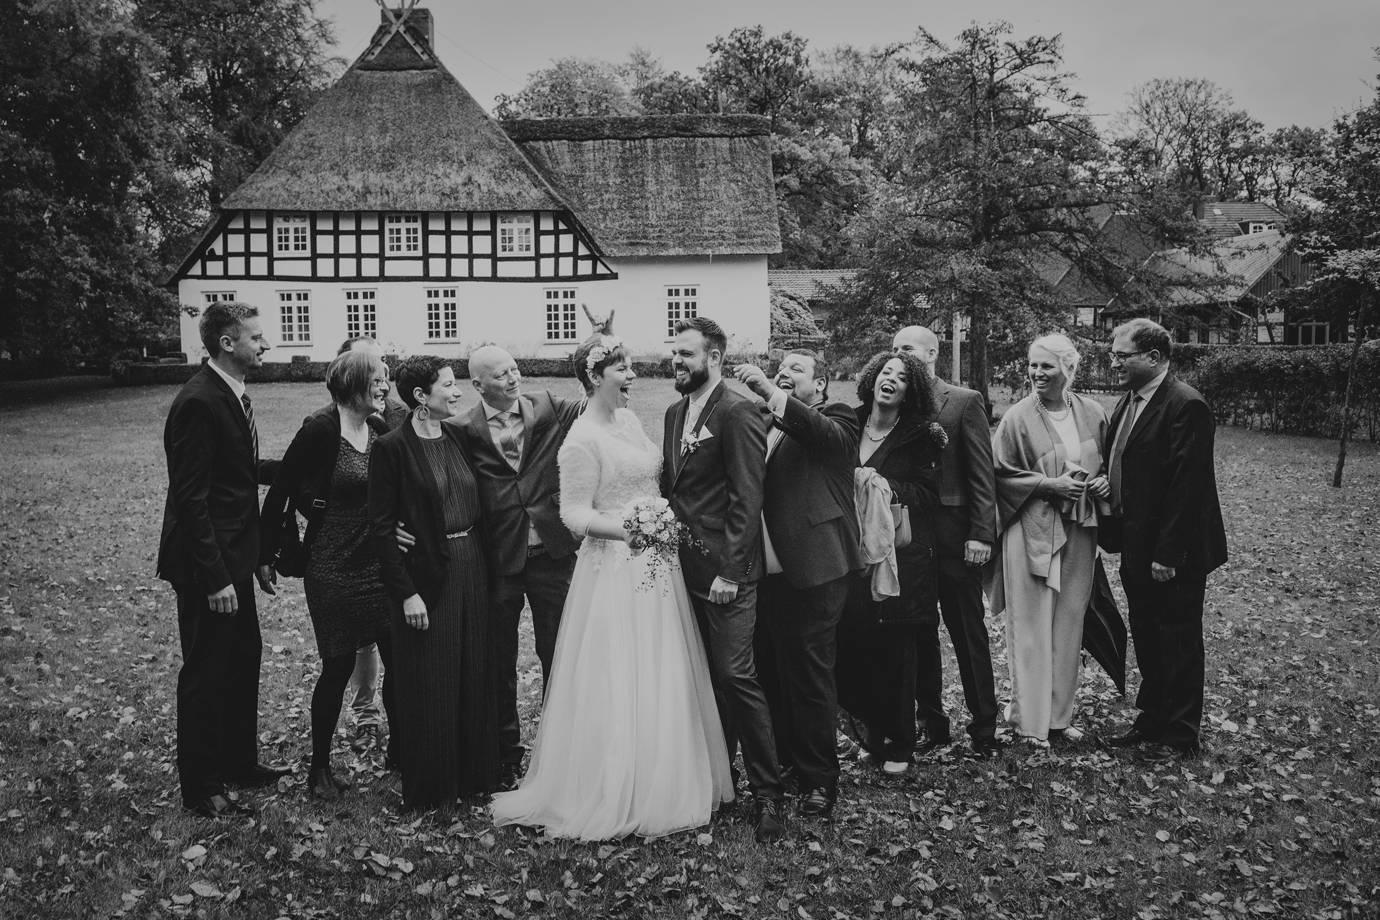 hochzeitsfotograf luer kropp hof 110 - Friderike+Florian